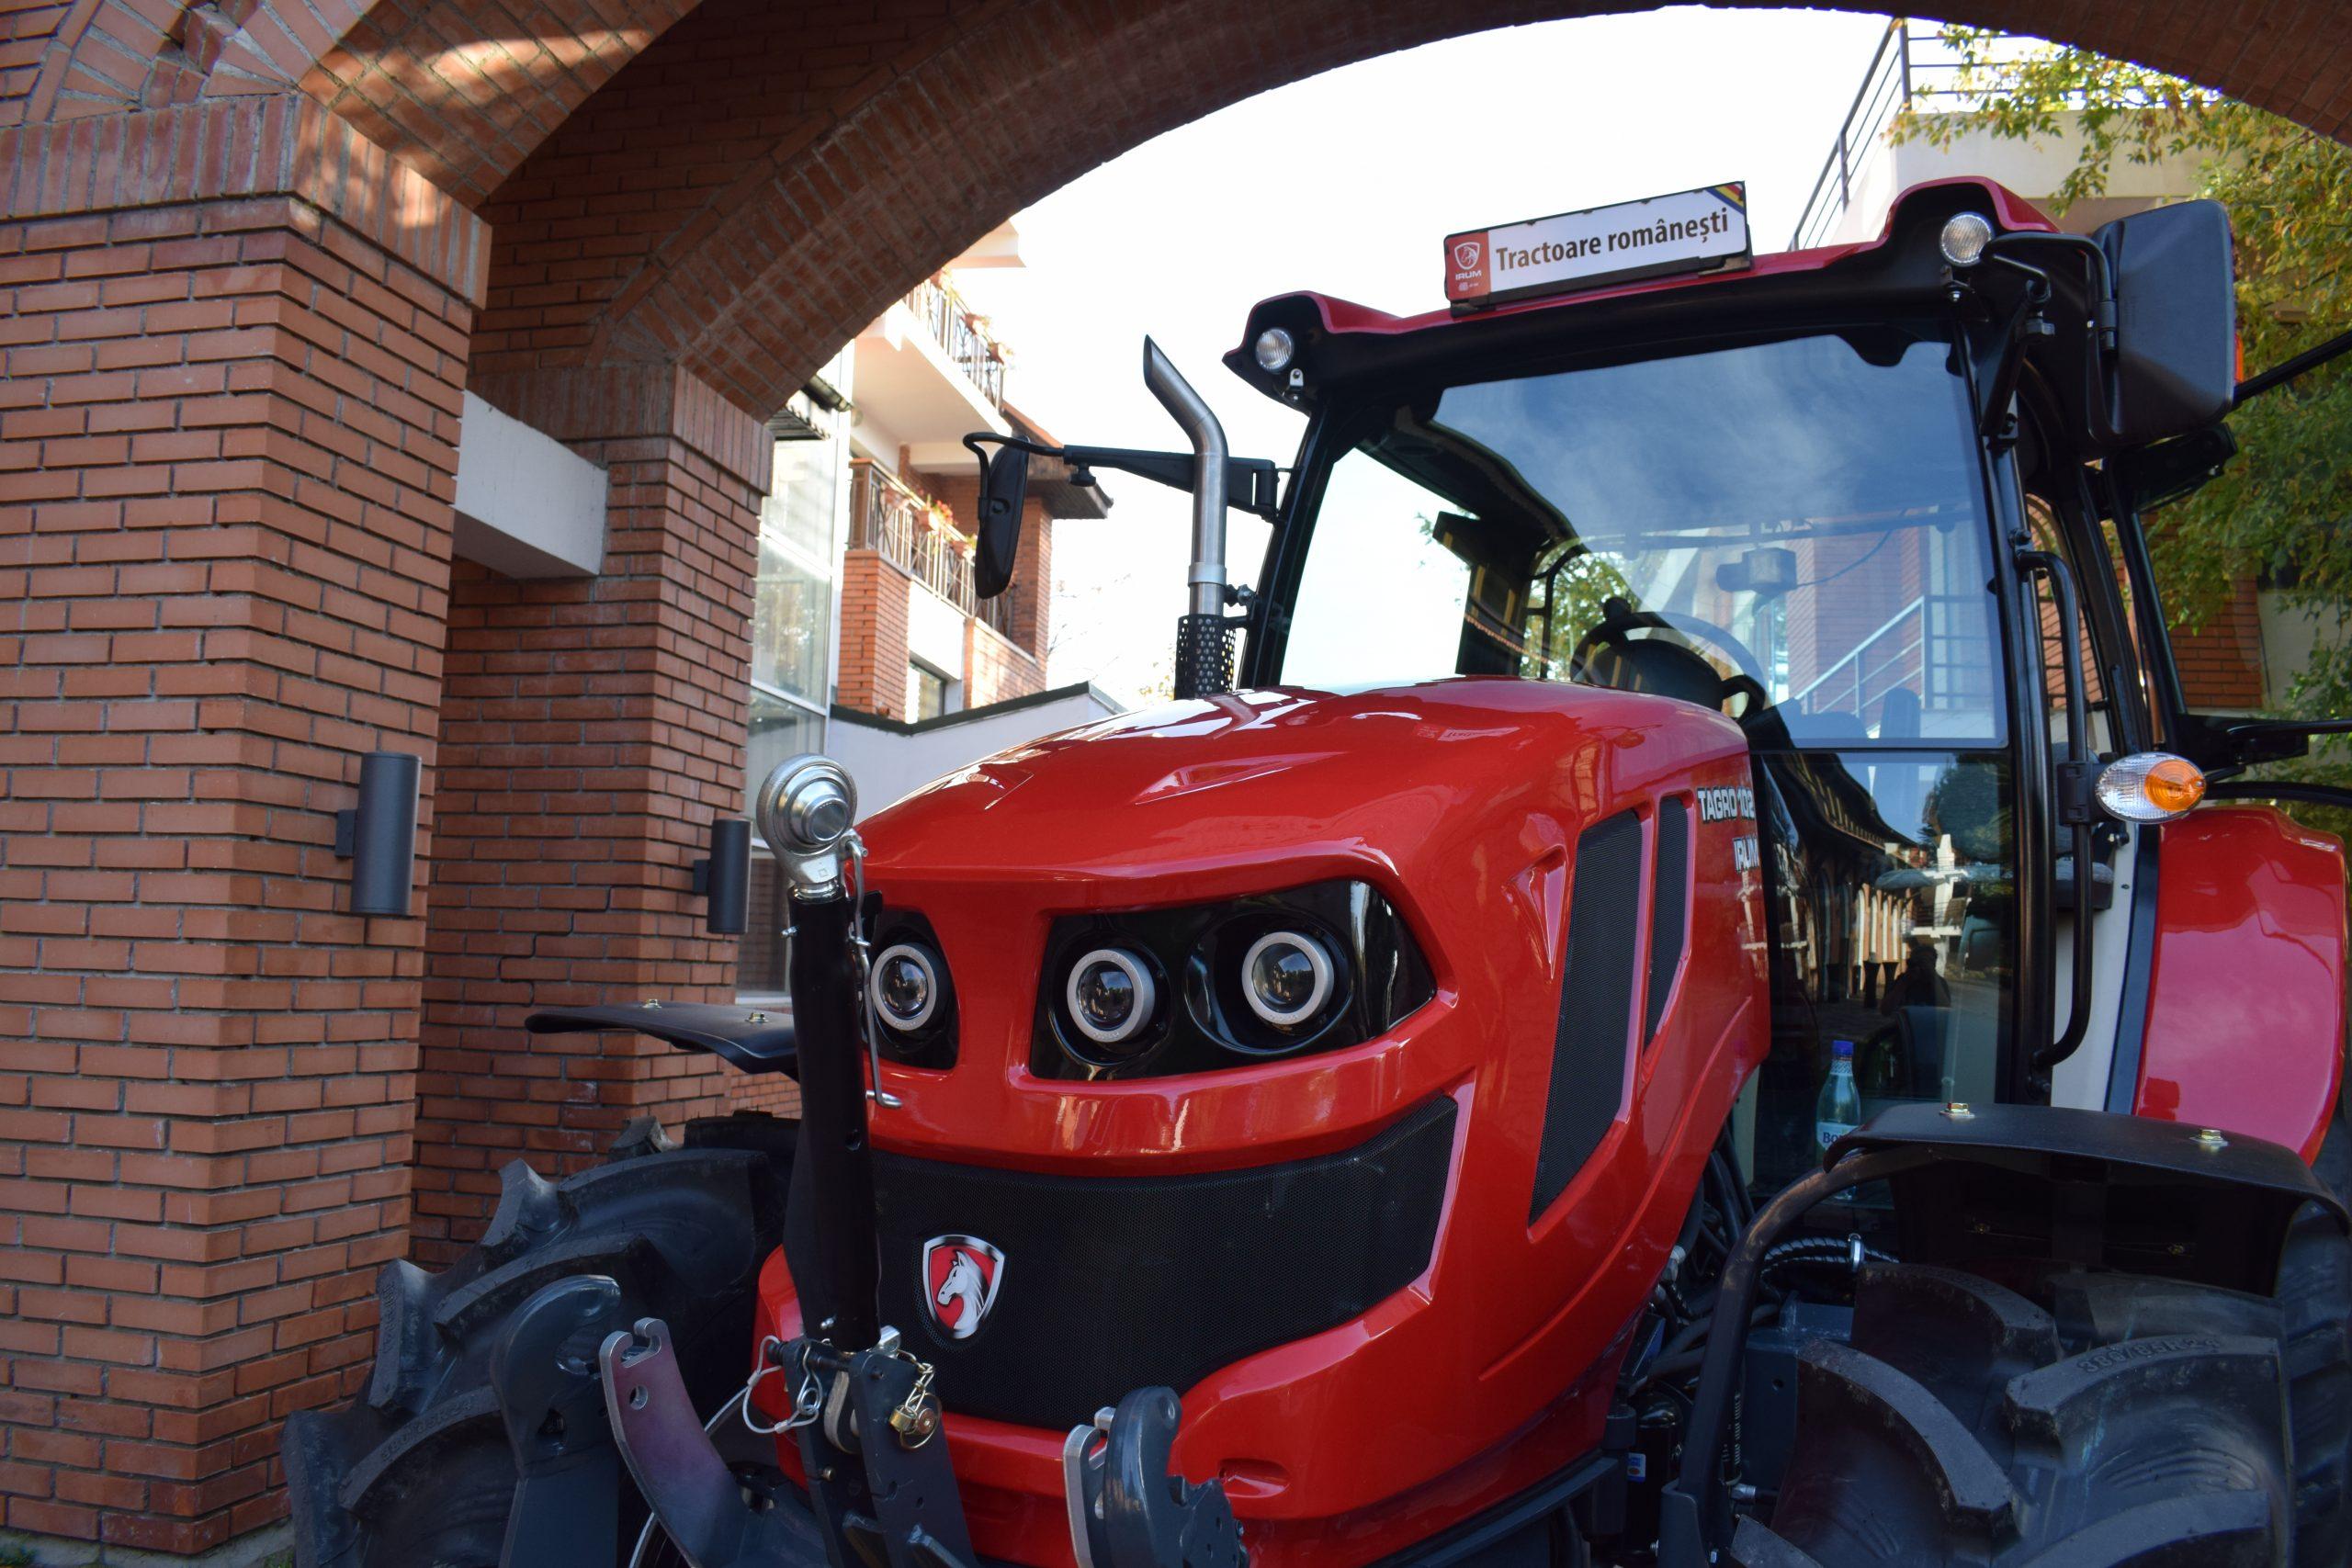 Tractor romanesc Tagro Irum 1